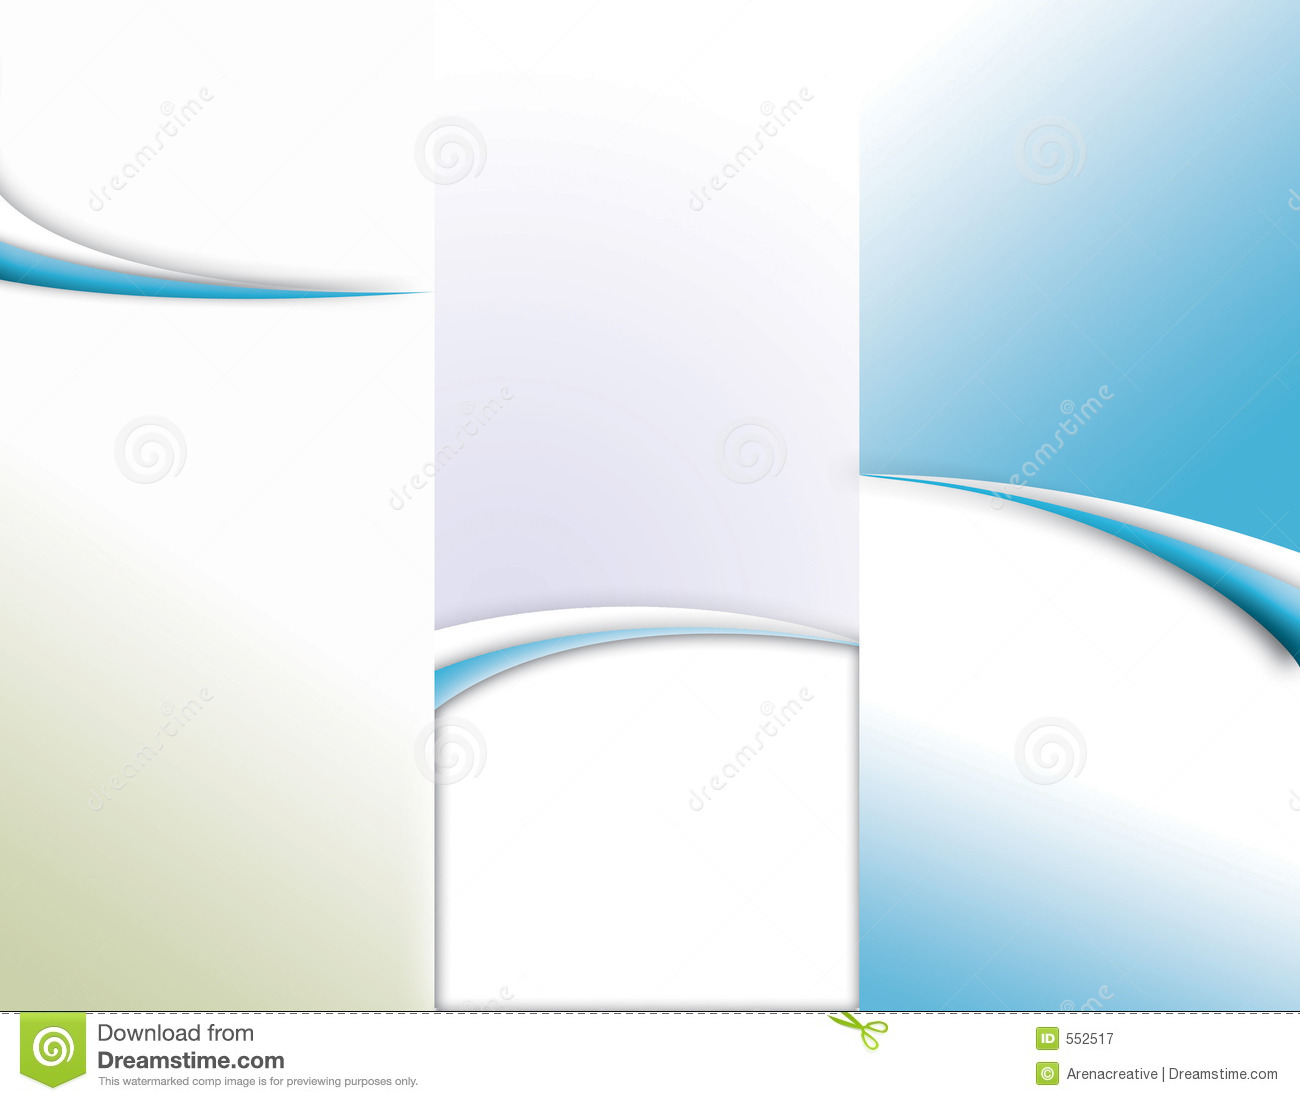 14 Blank Tri Fold Brochure Template Word Images Free Blank Tri